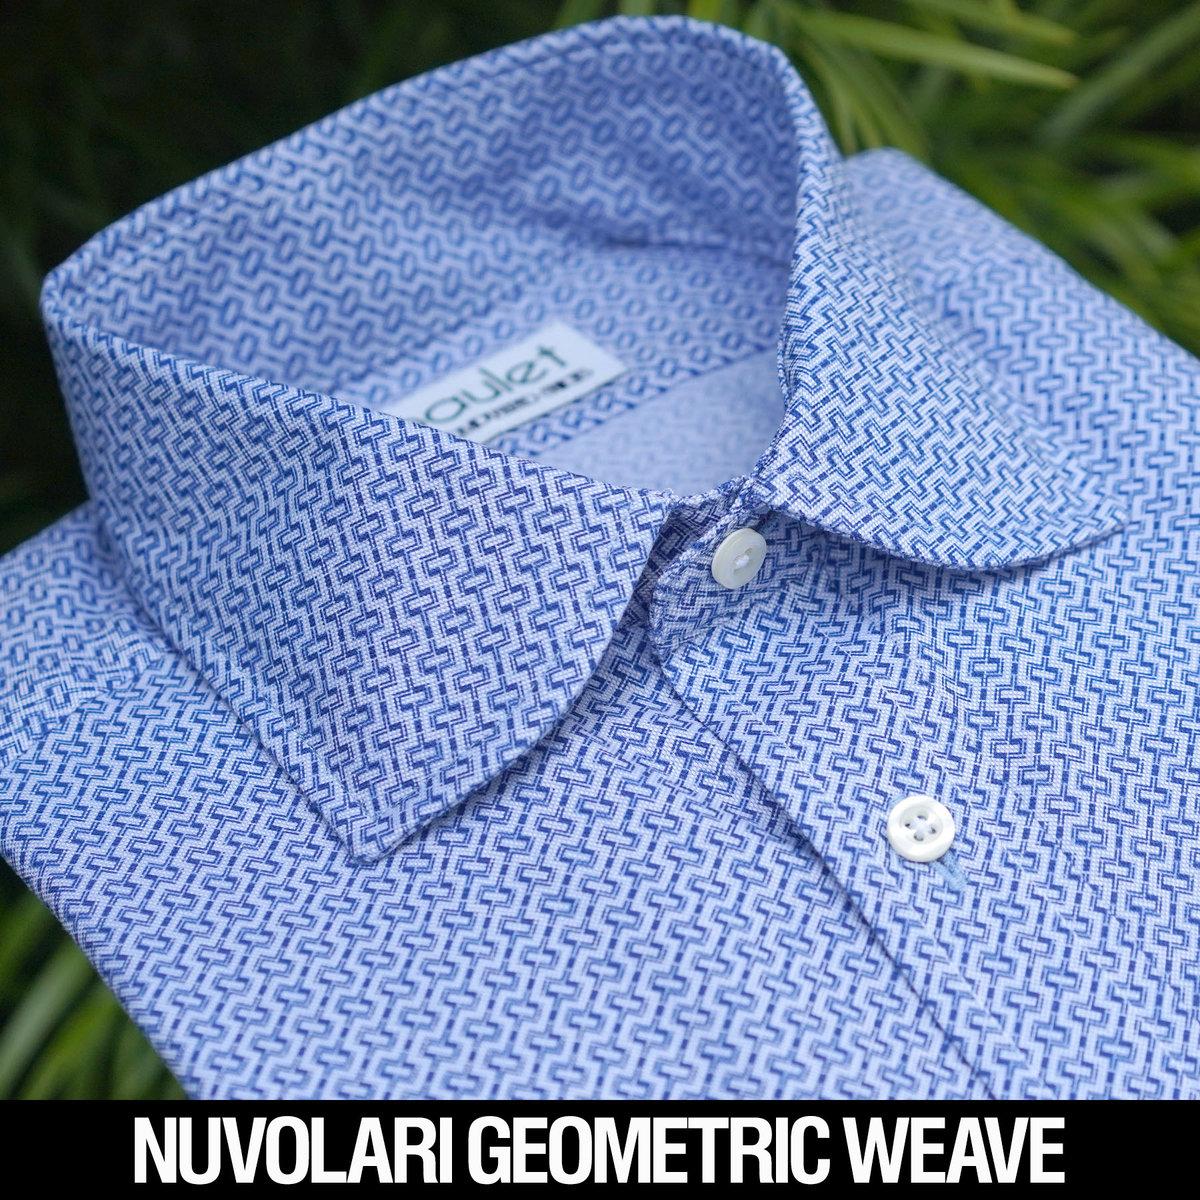 Nuvolari Geometric Weave.jpg